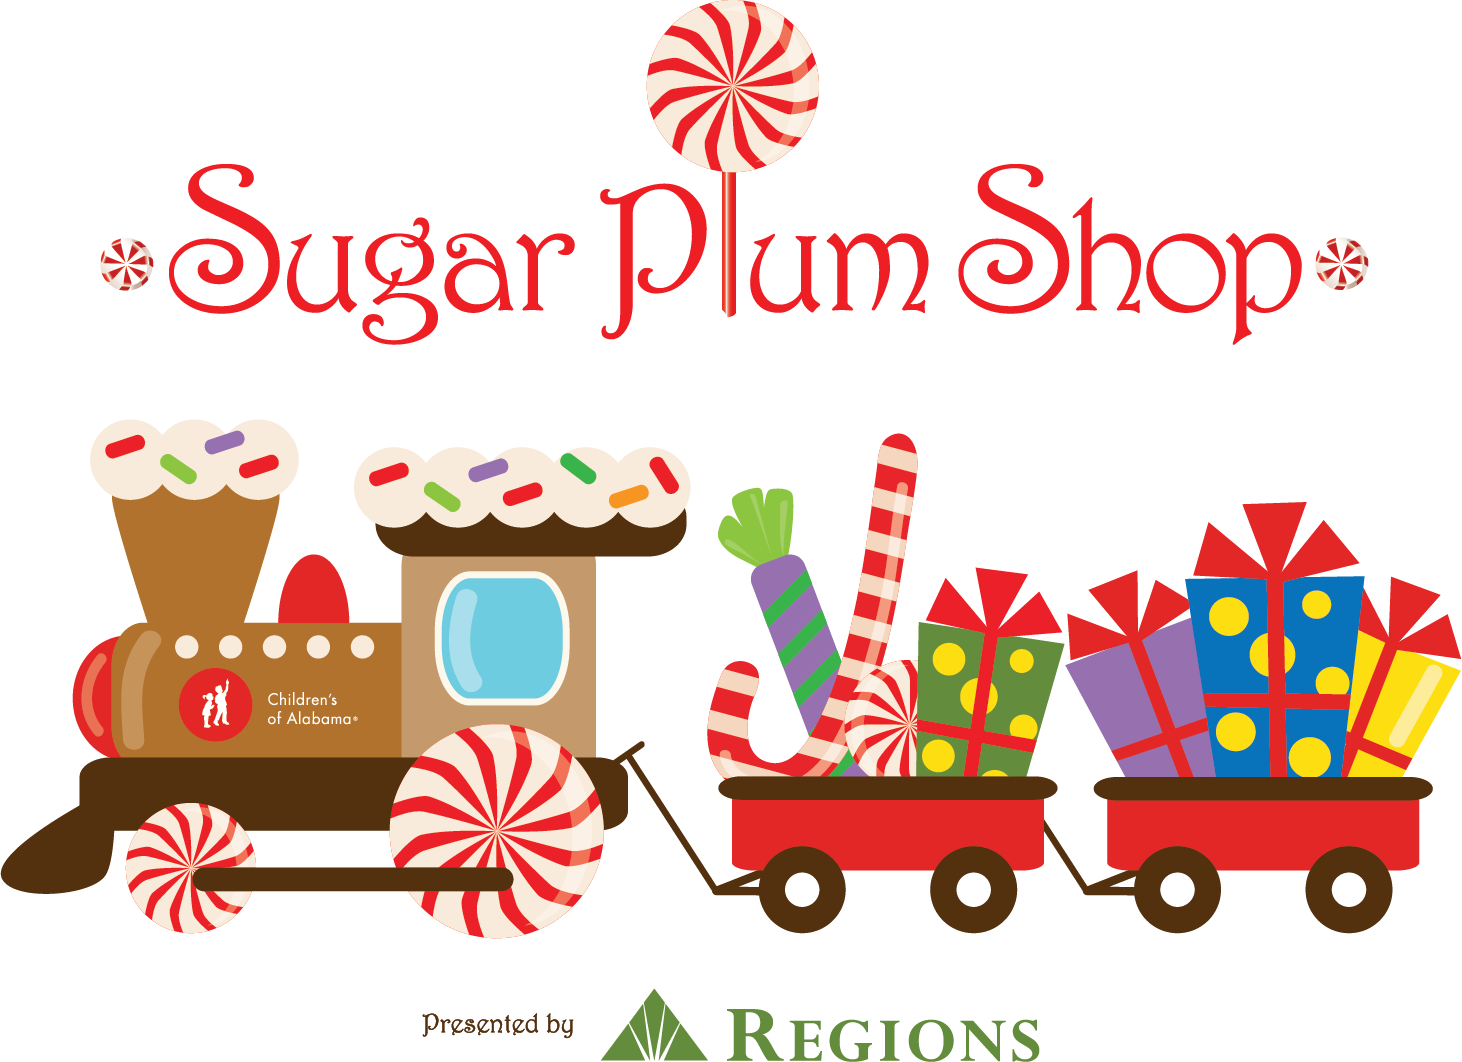 Sugar Plum Shop at Children's of Alabama